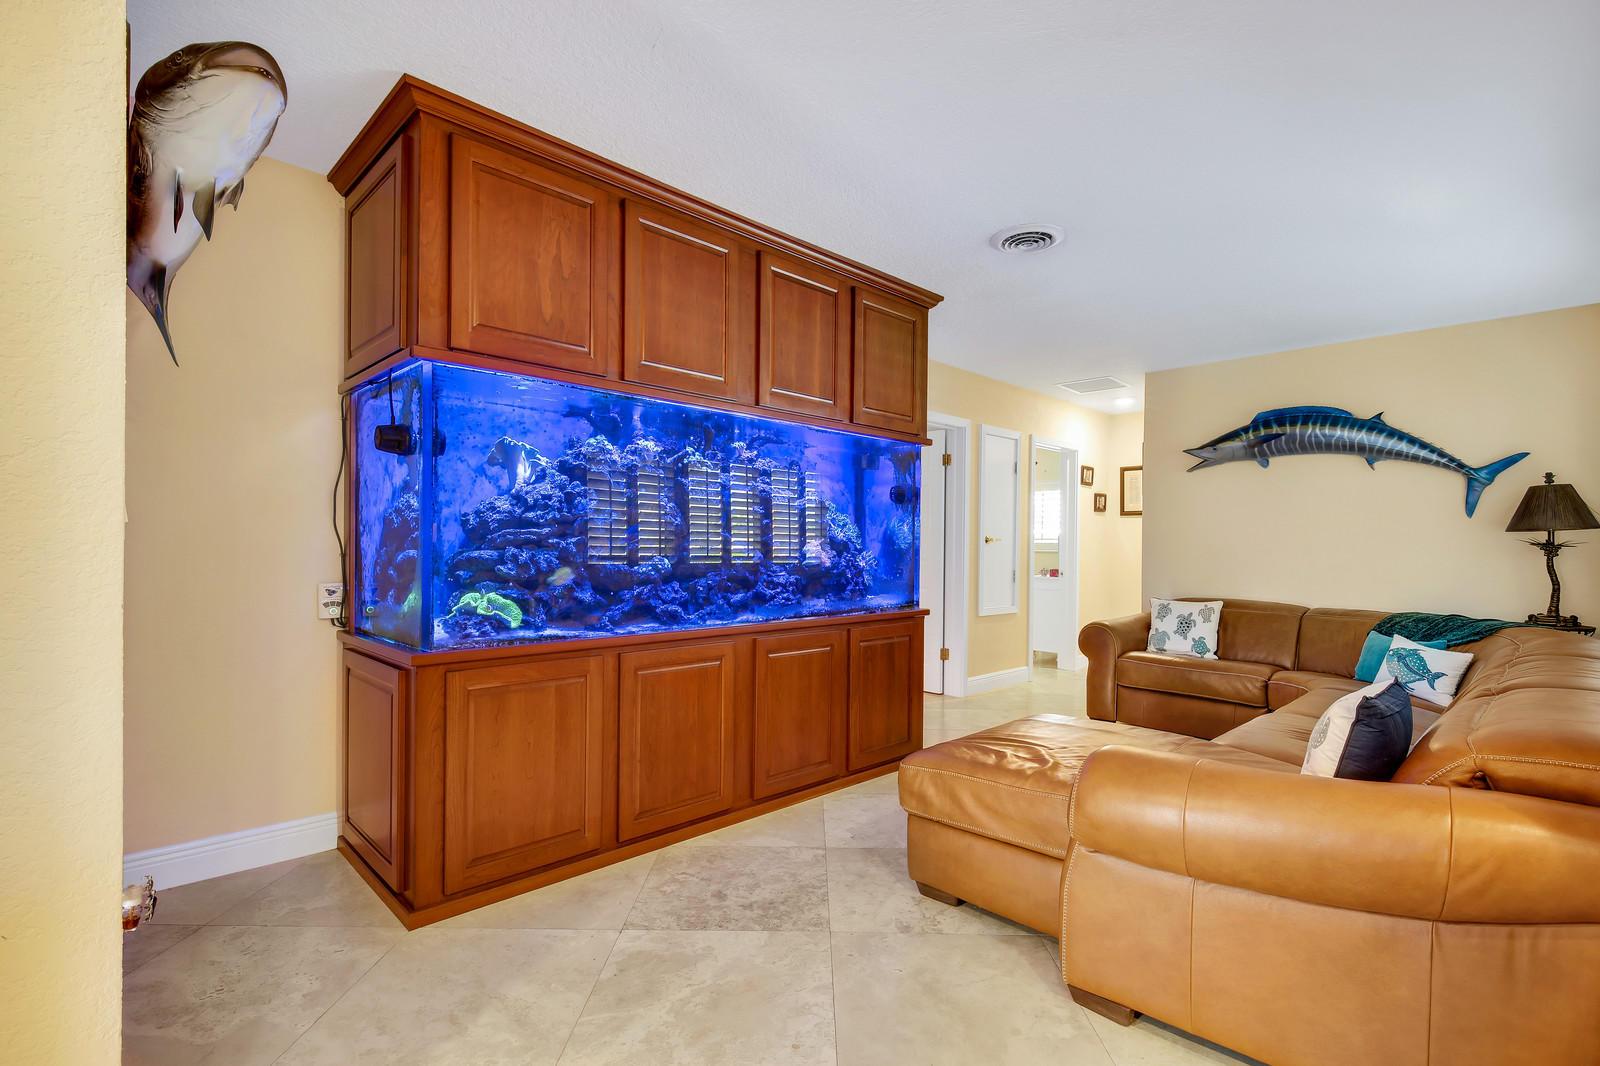 2741 8th St, Pompano Beach, FL 33062